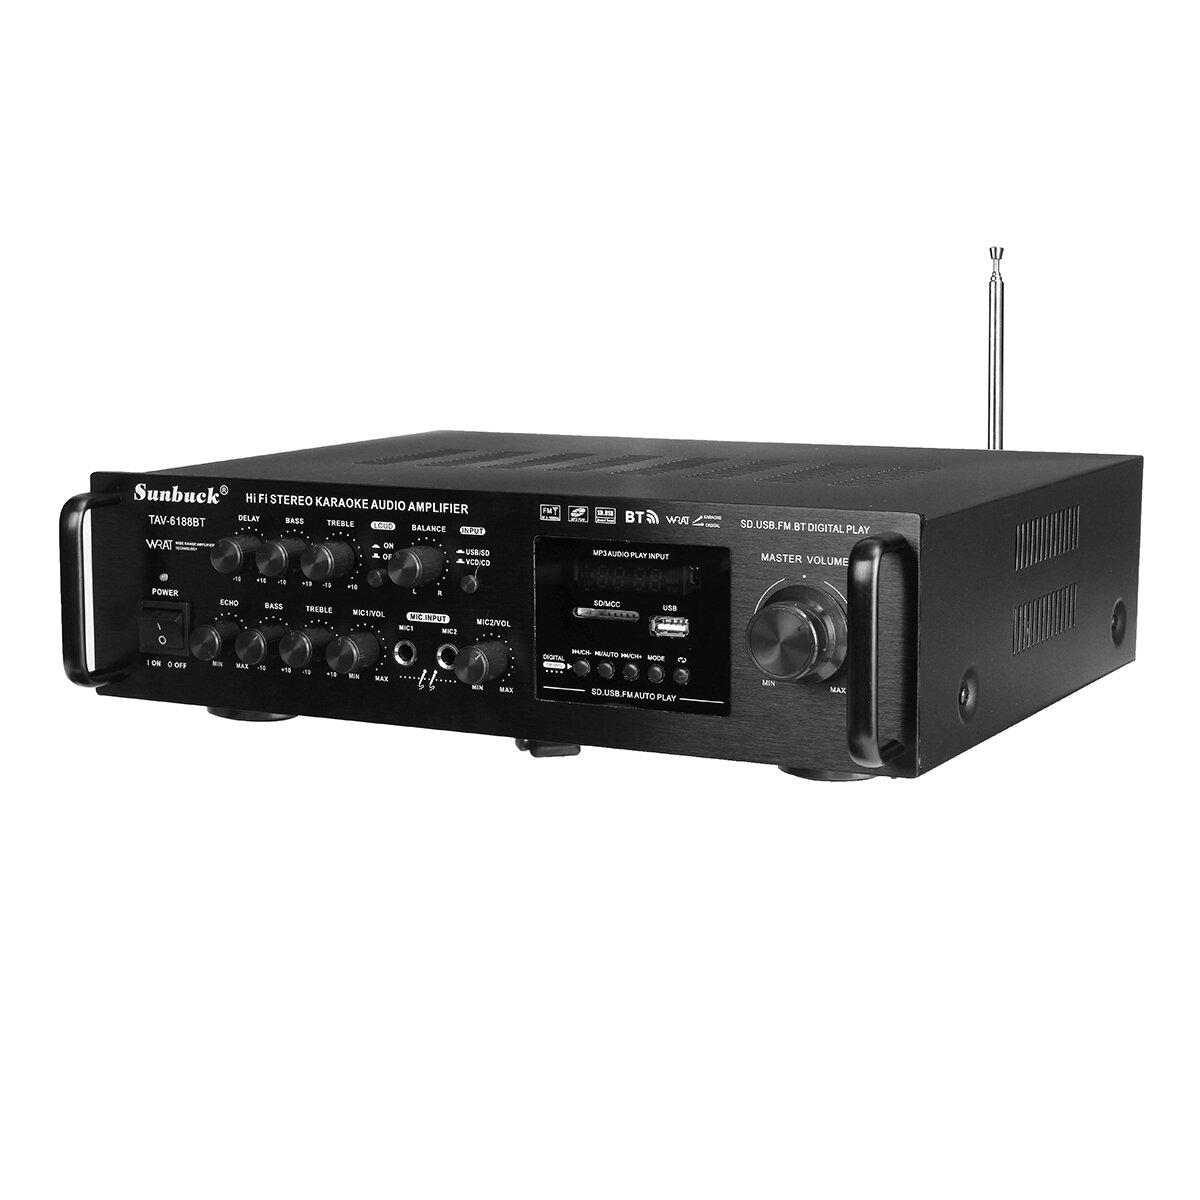 Sunbuck TAV-6188BT 2000W 4ohm Setero bluetooth FM Karaoke Amplifier RC Support 2 Microphone